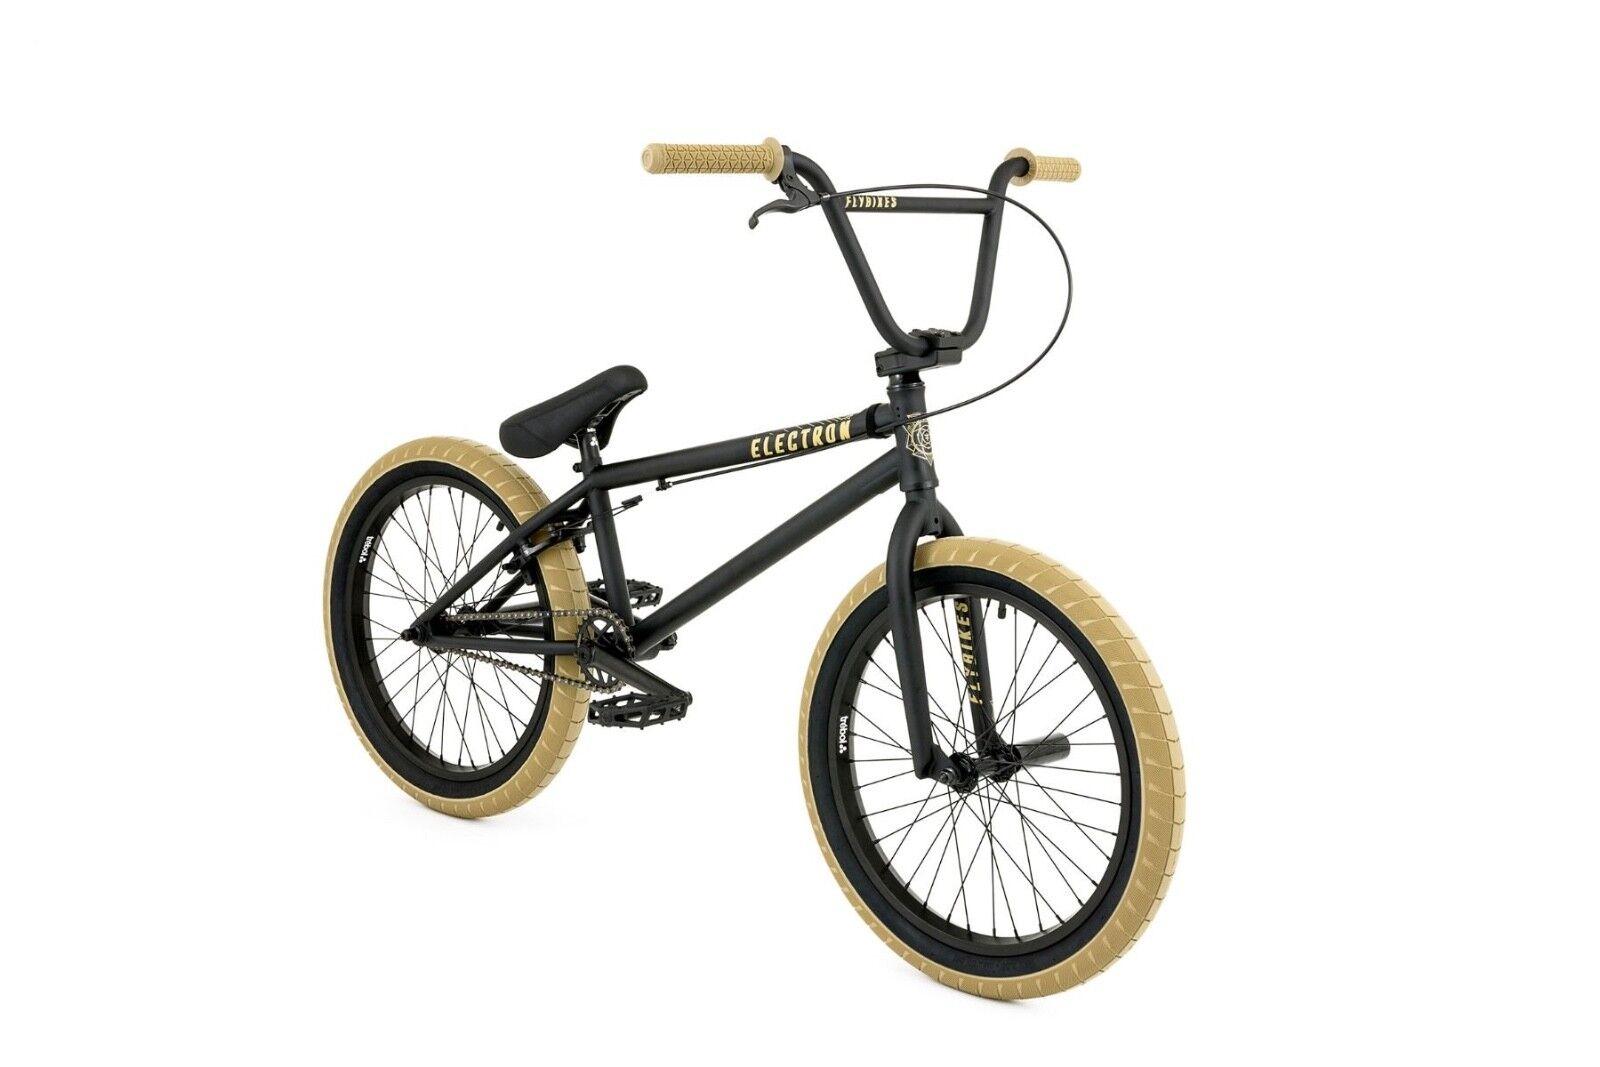 Fly Bikes 2018 Electron Electron Electron LHD Street Park Bicicleta BMX Negro Plano 20.5 en toptube 44c028